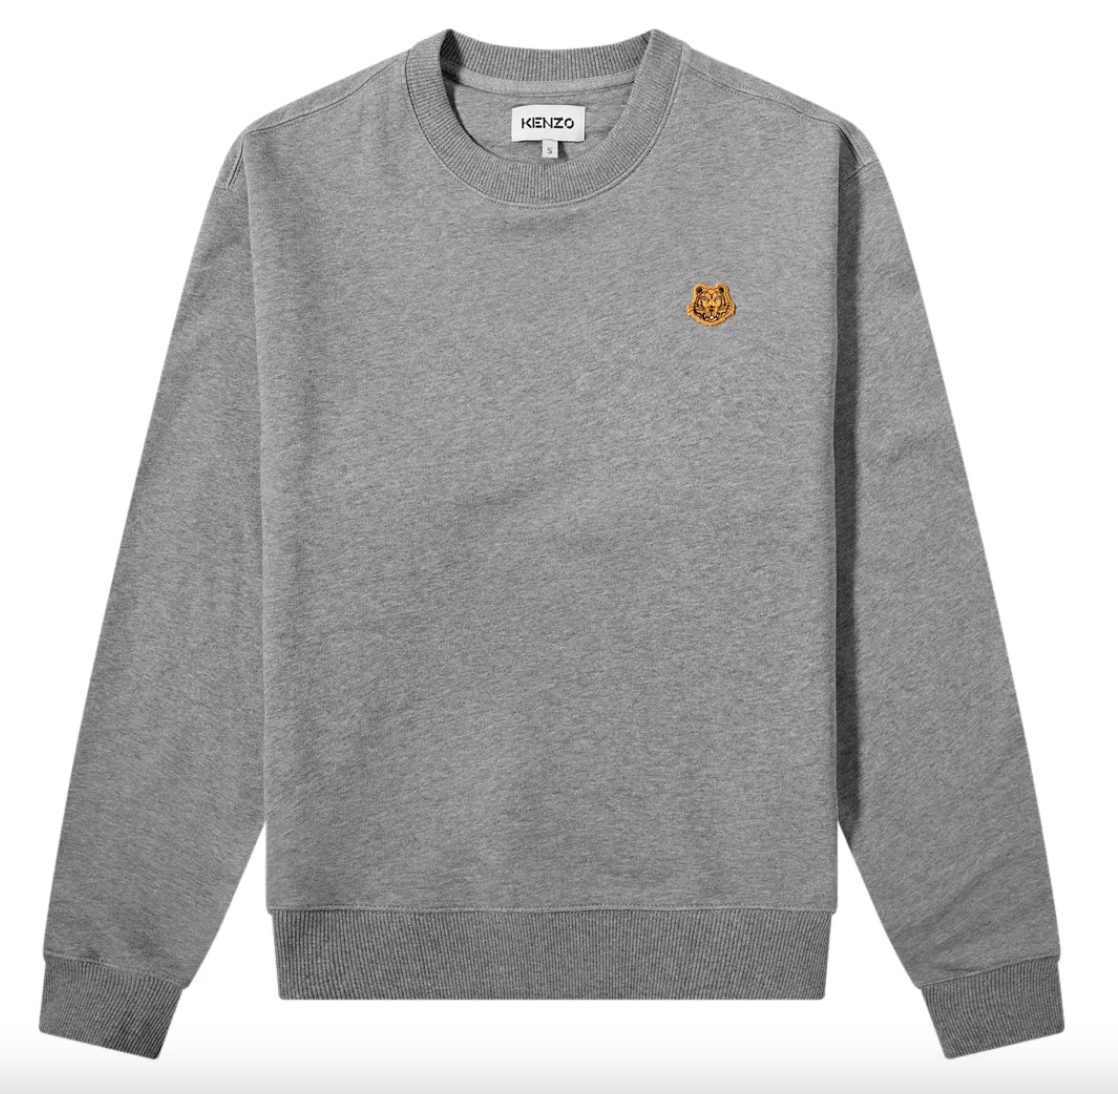 grey sweater designer kenzo